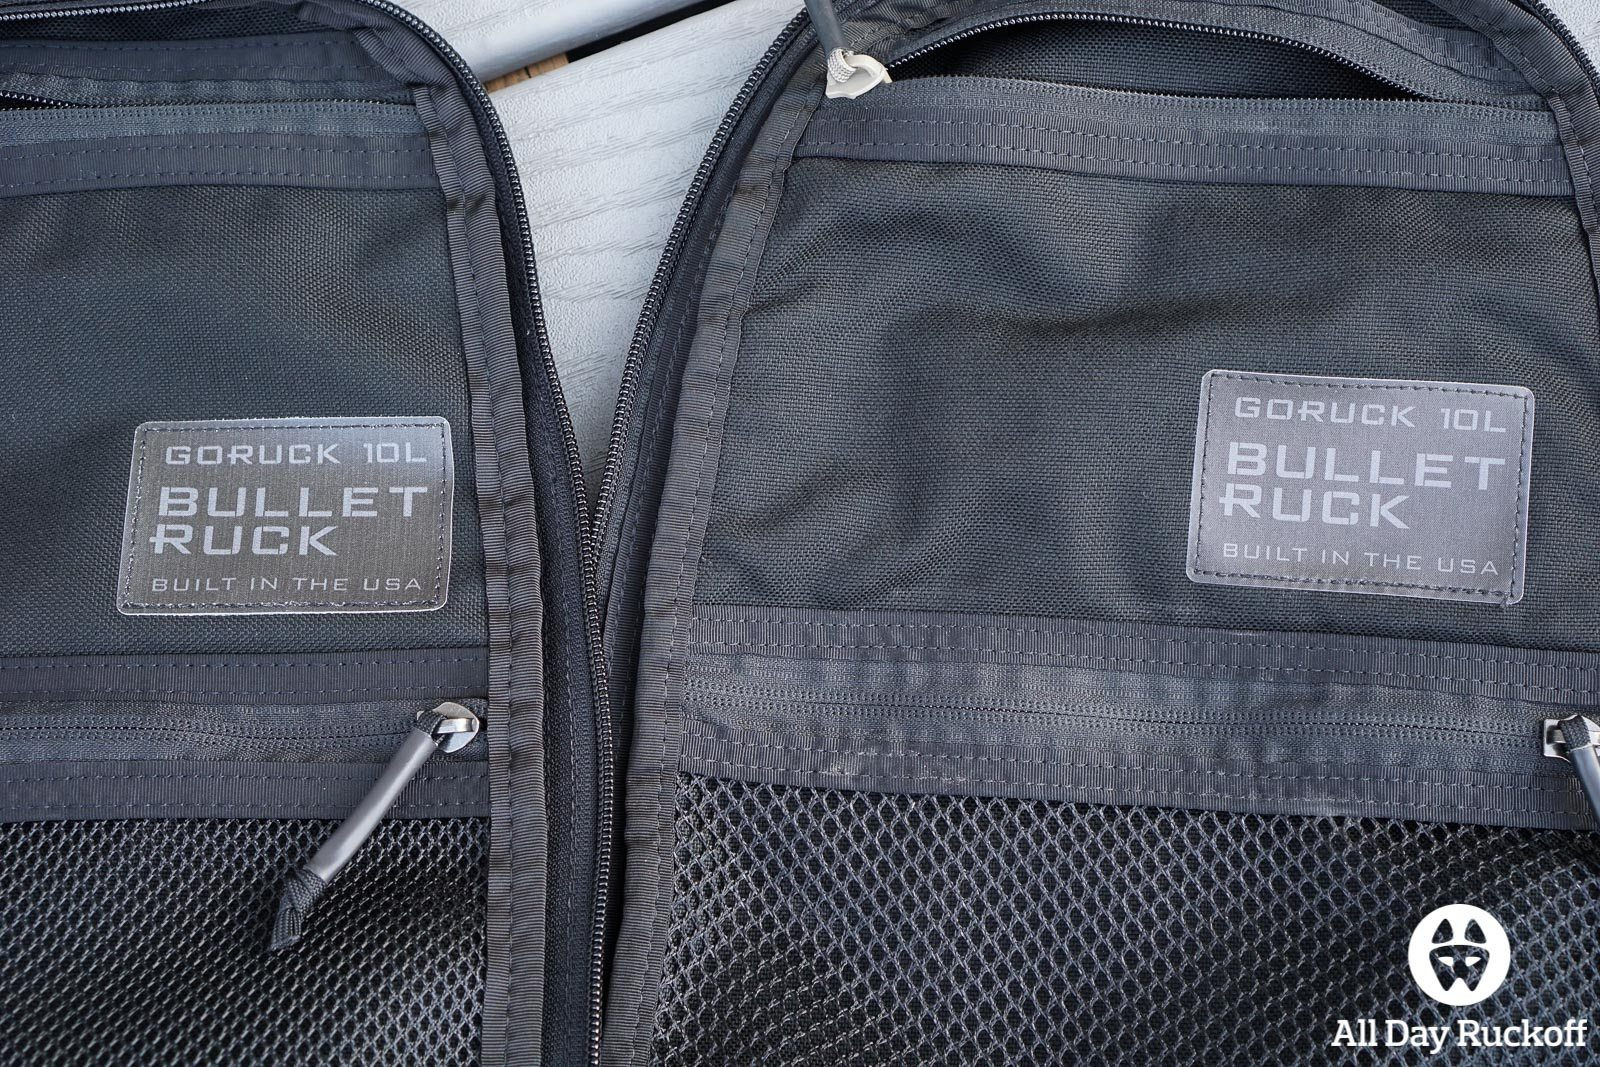 GORUCK Bullet Ruck 10L Comparison - Tags